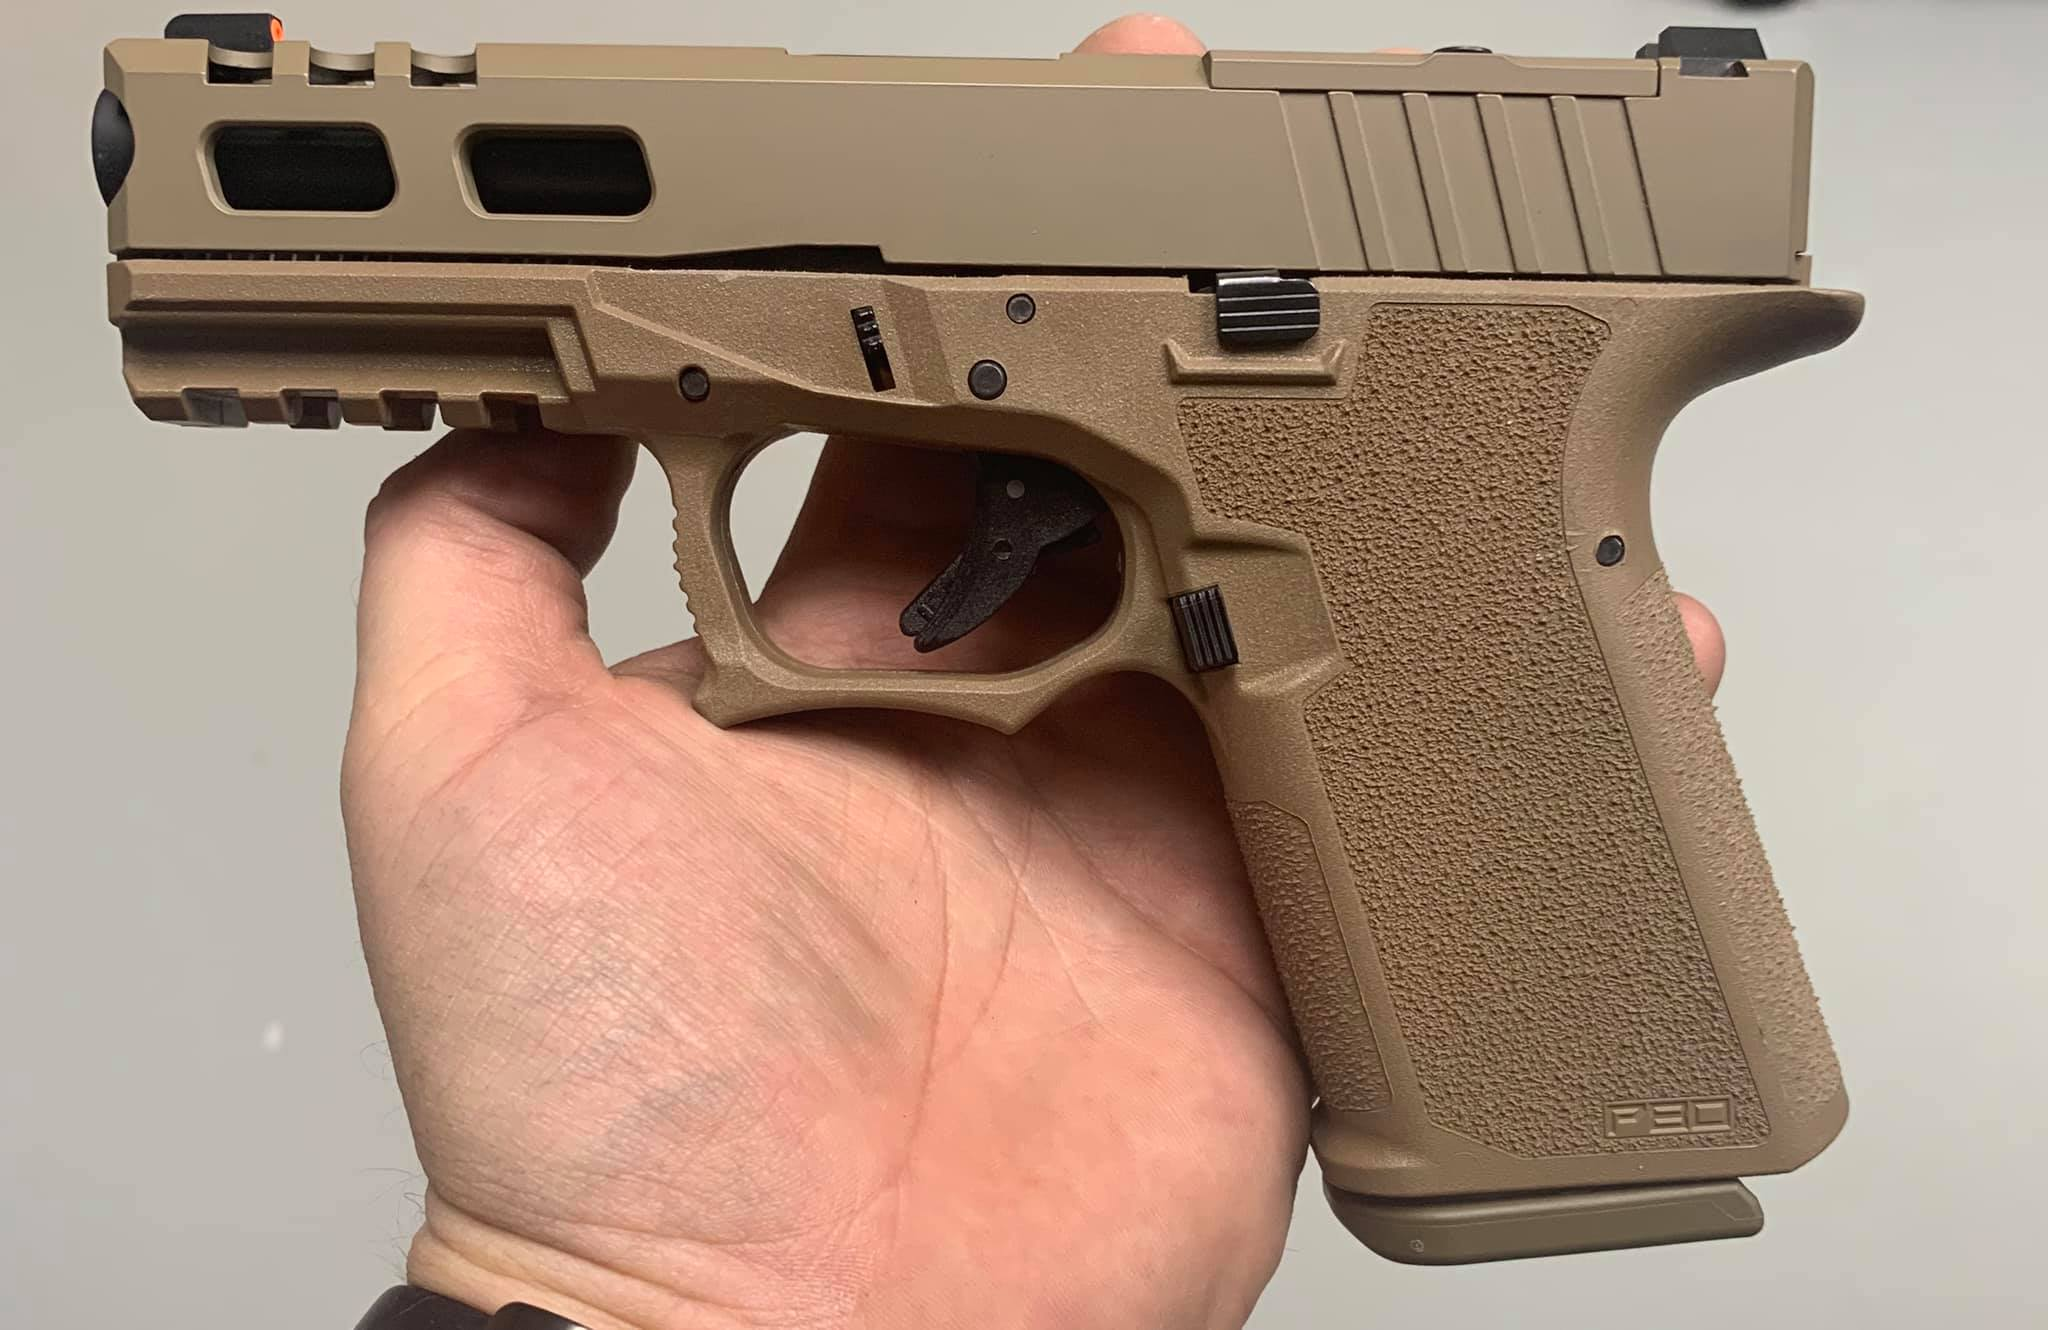 Gorilla Machining Glock 19 Build Your Upper Half Custom Slides with  Trijicon RMR cut out - $260